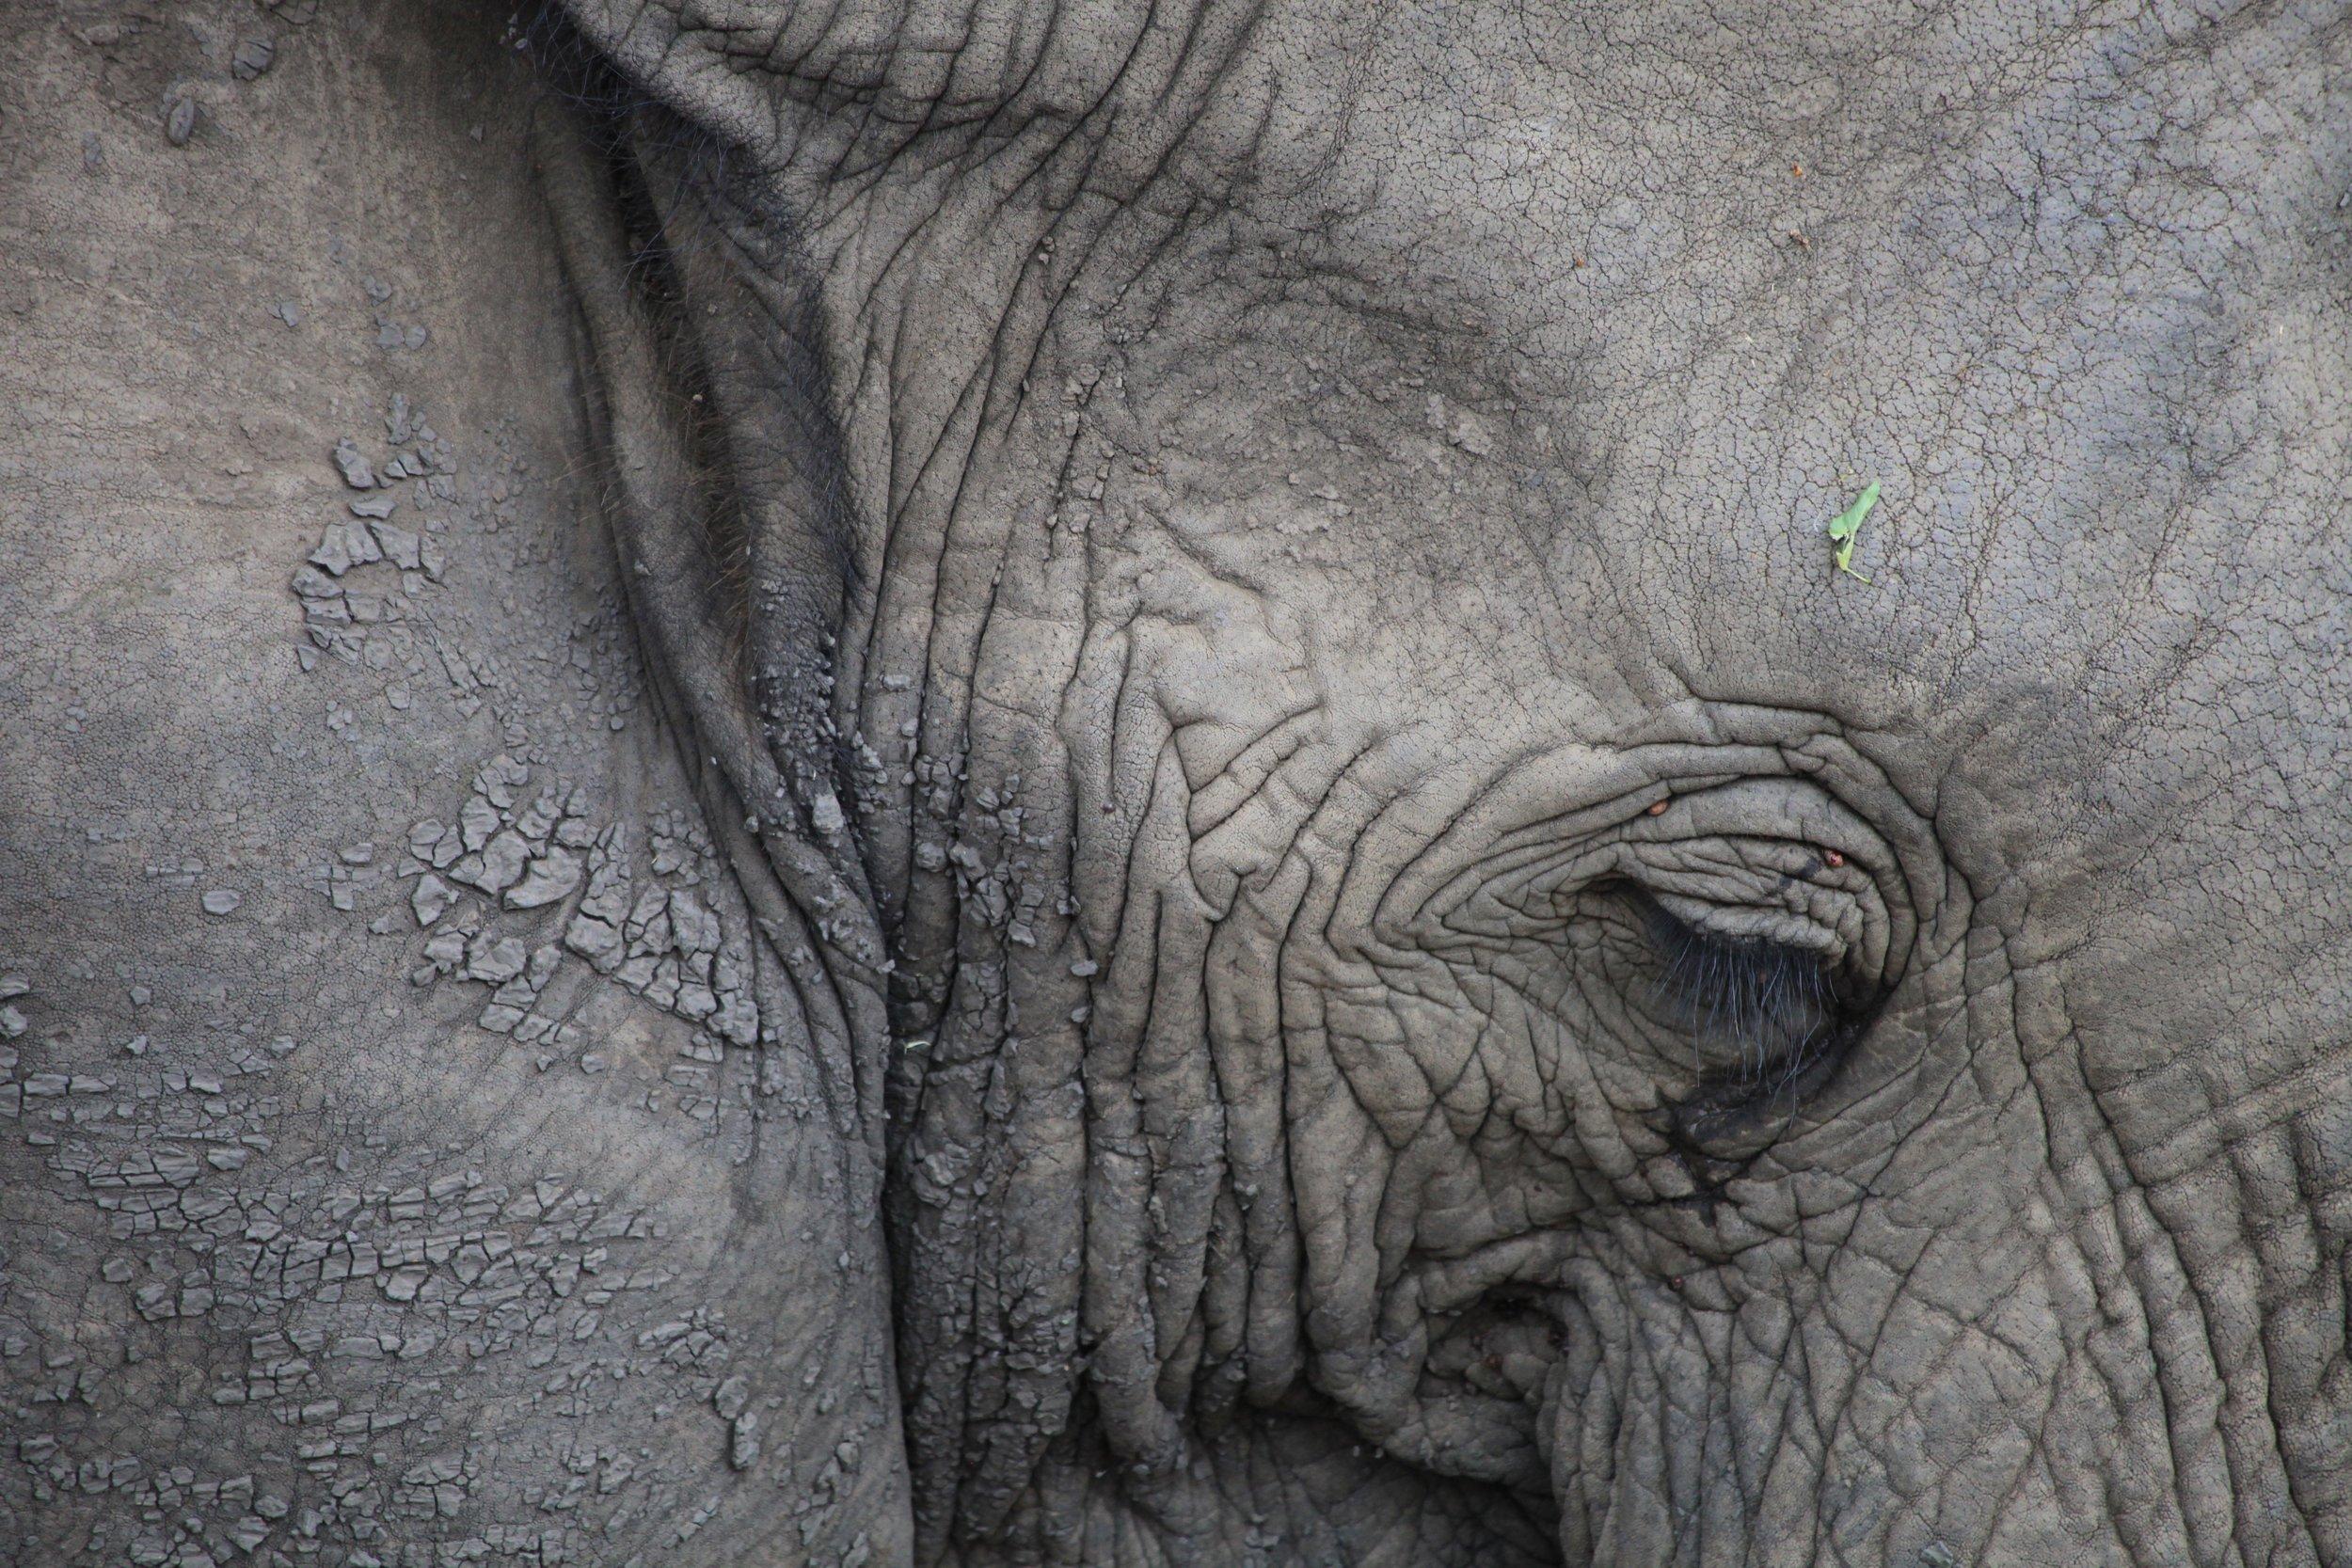 elephant_peace.jpg